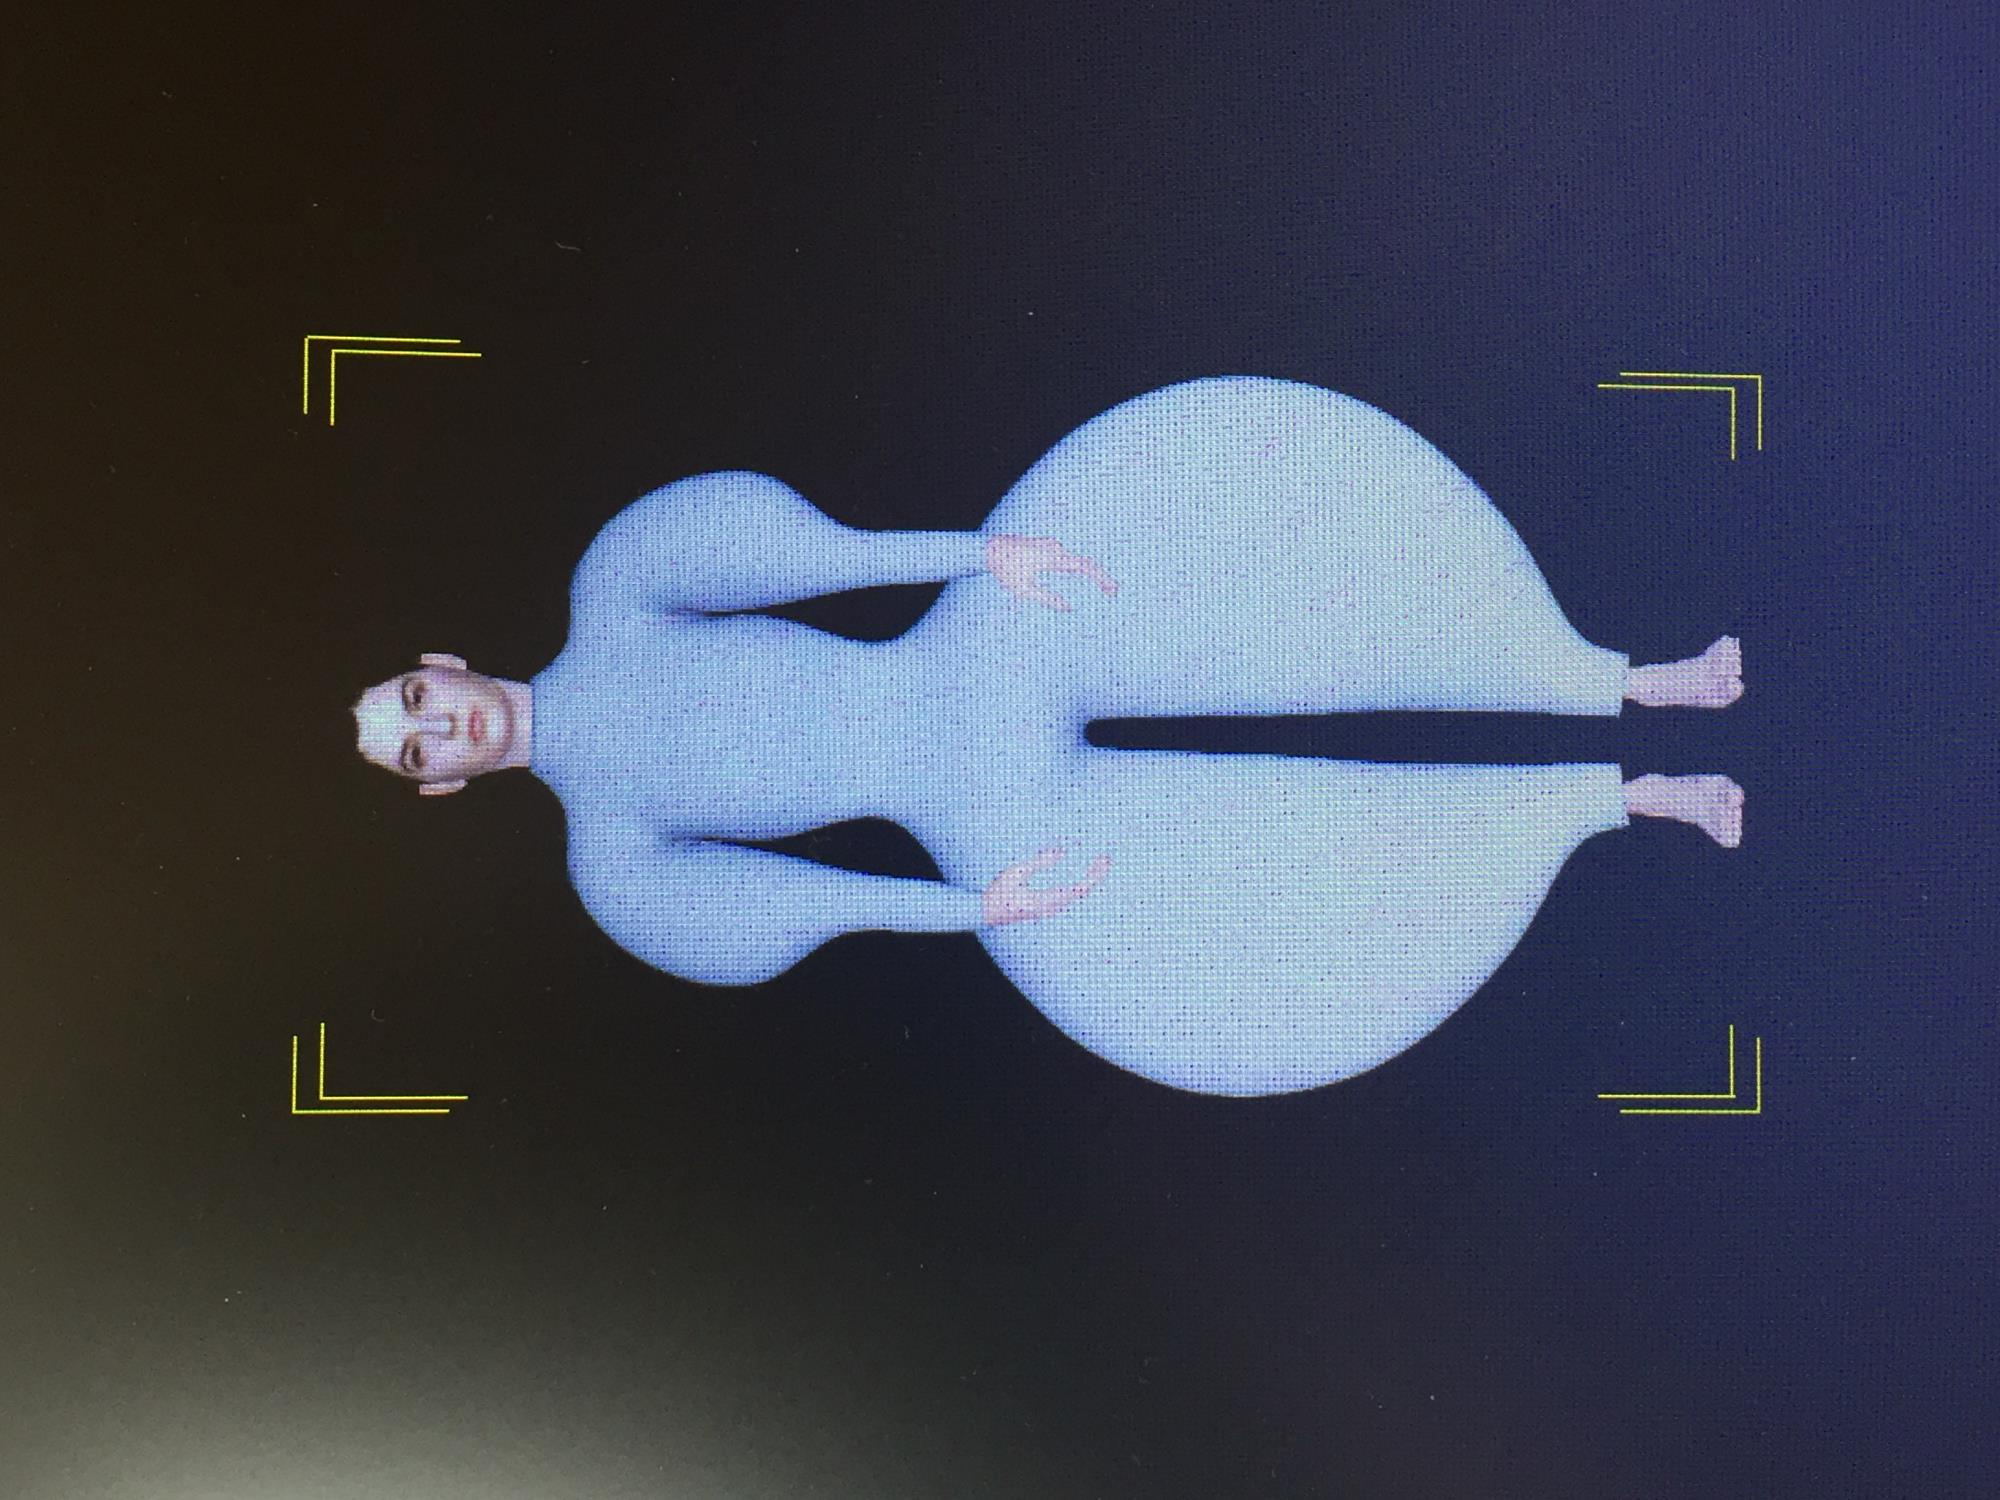 https://forum.reallusion.com/uploads/images/35c55f93-1cbc-46d3-be2a-b373.jpg